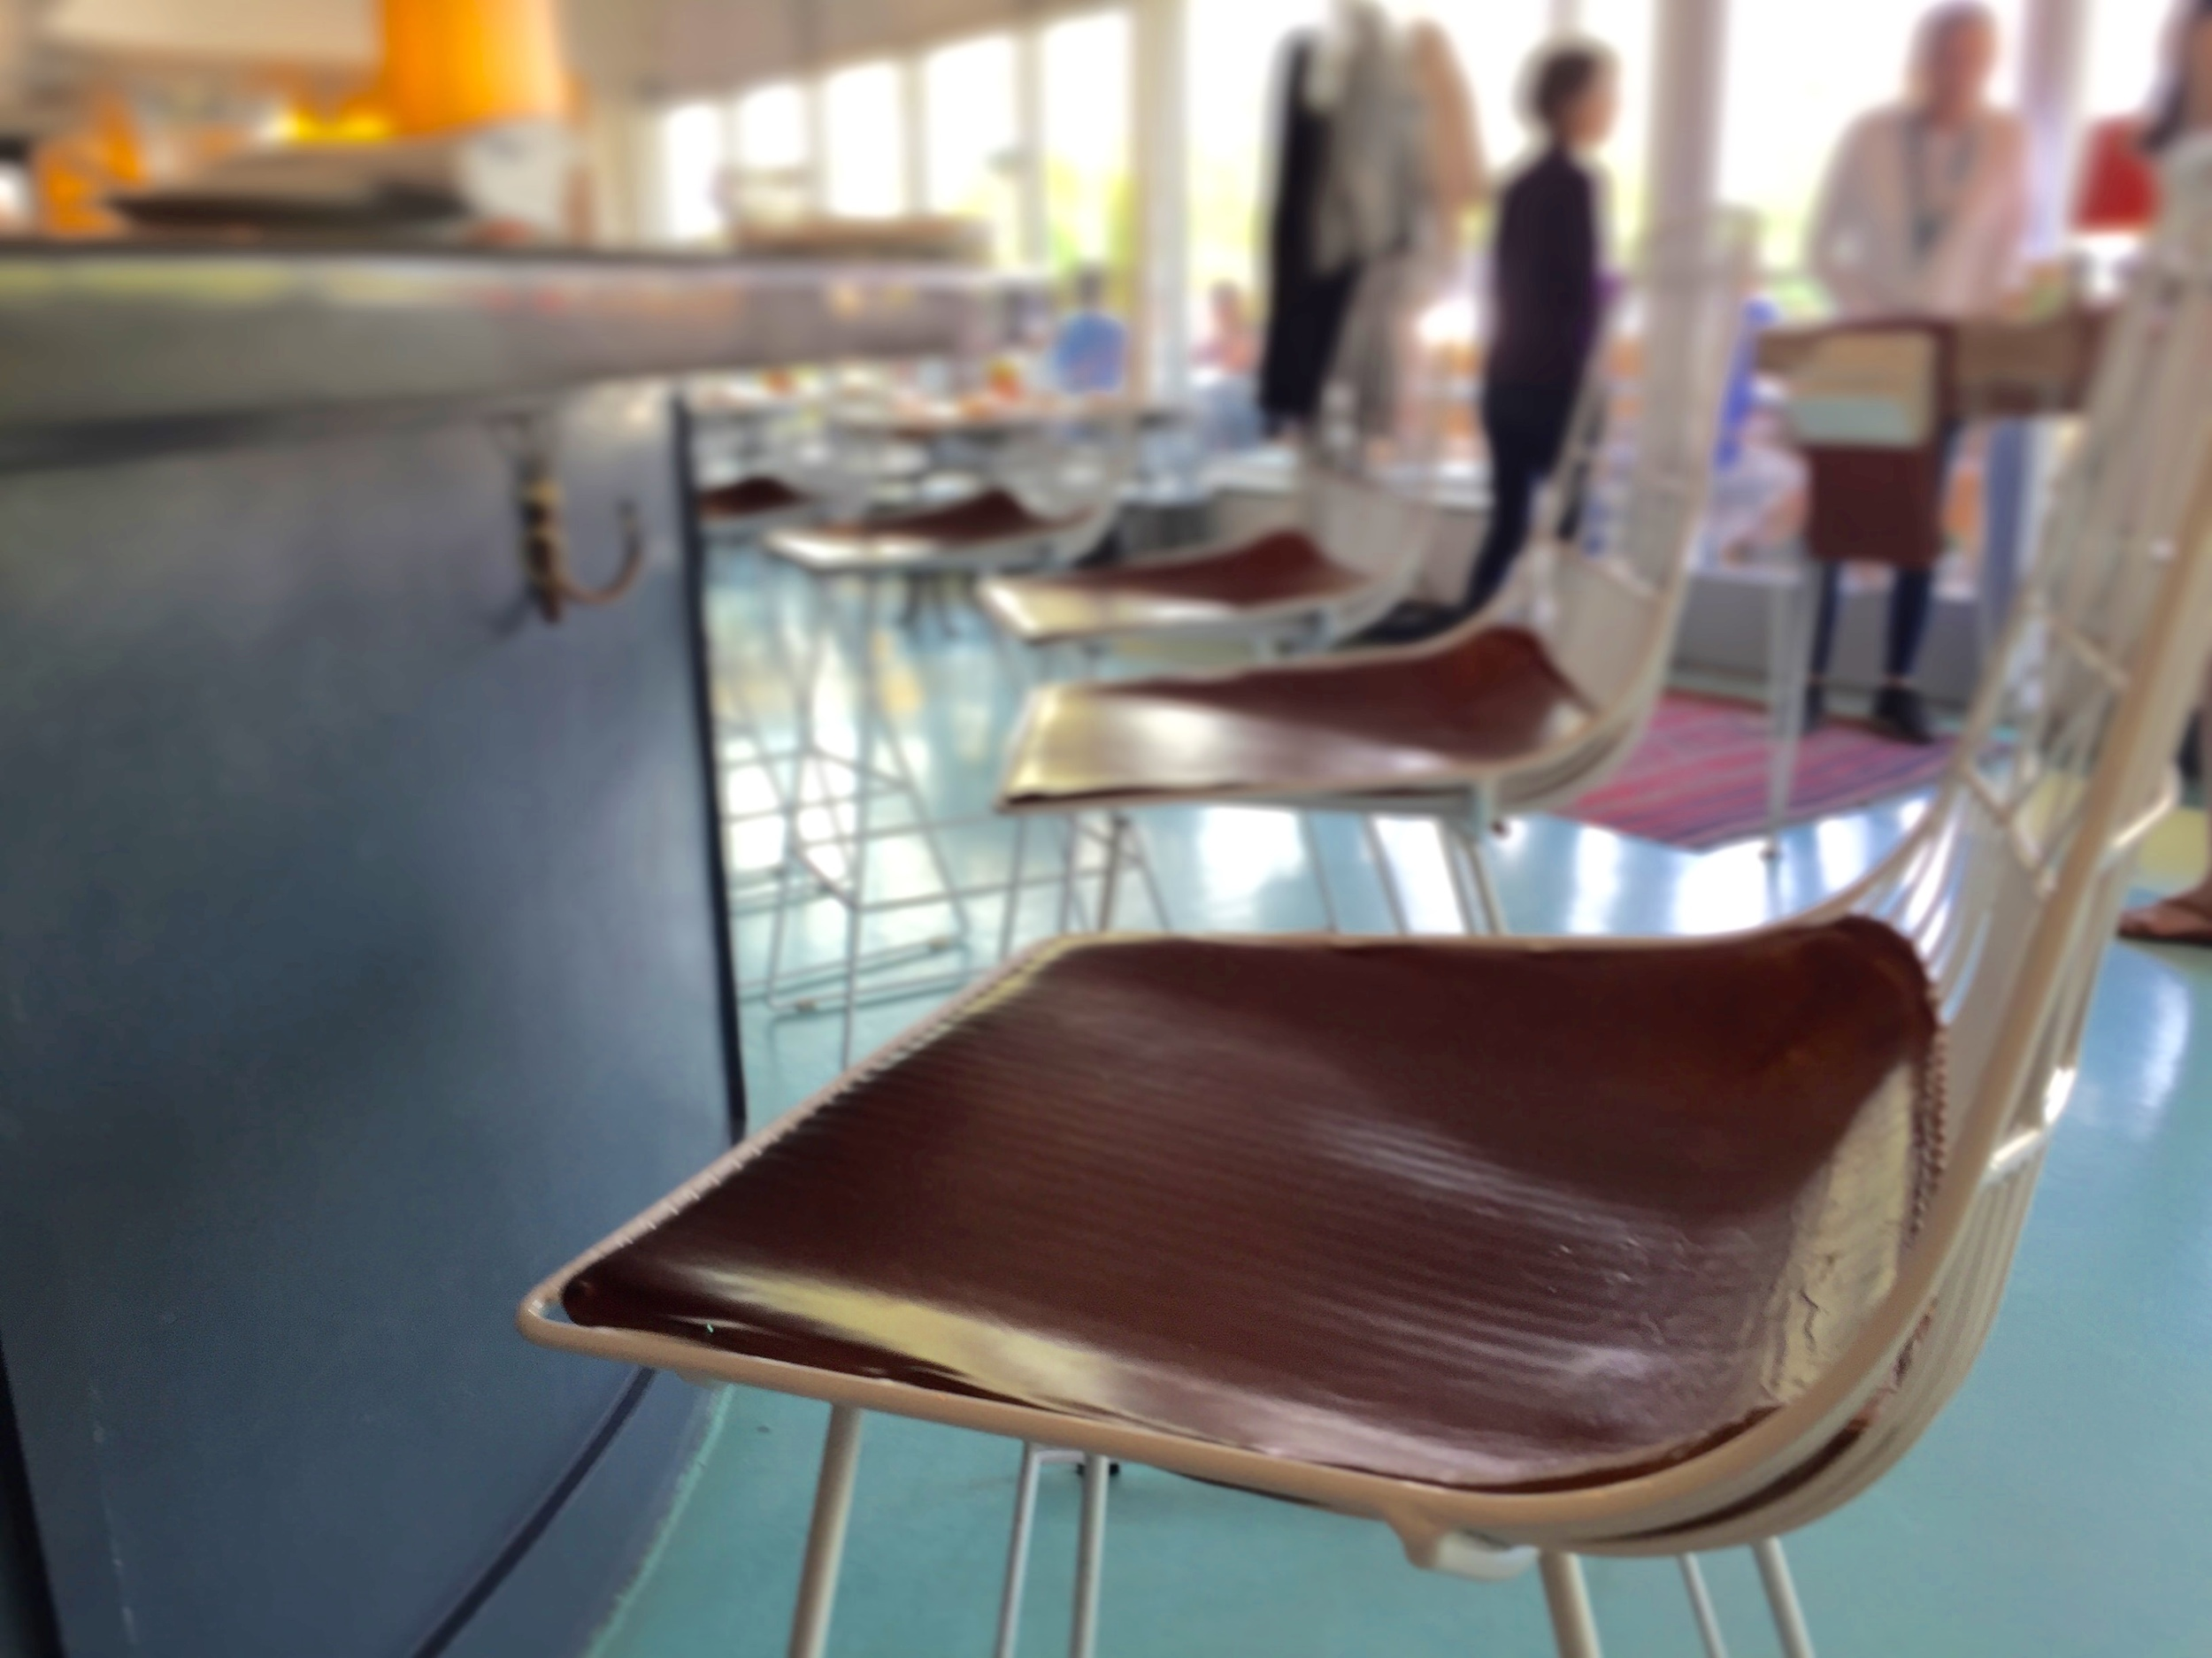 SEAT PADS FOR LAUNDERETTE DINER, AUSTIN